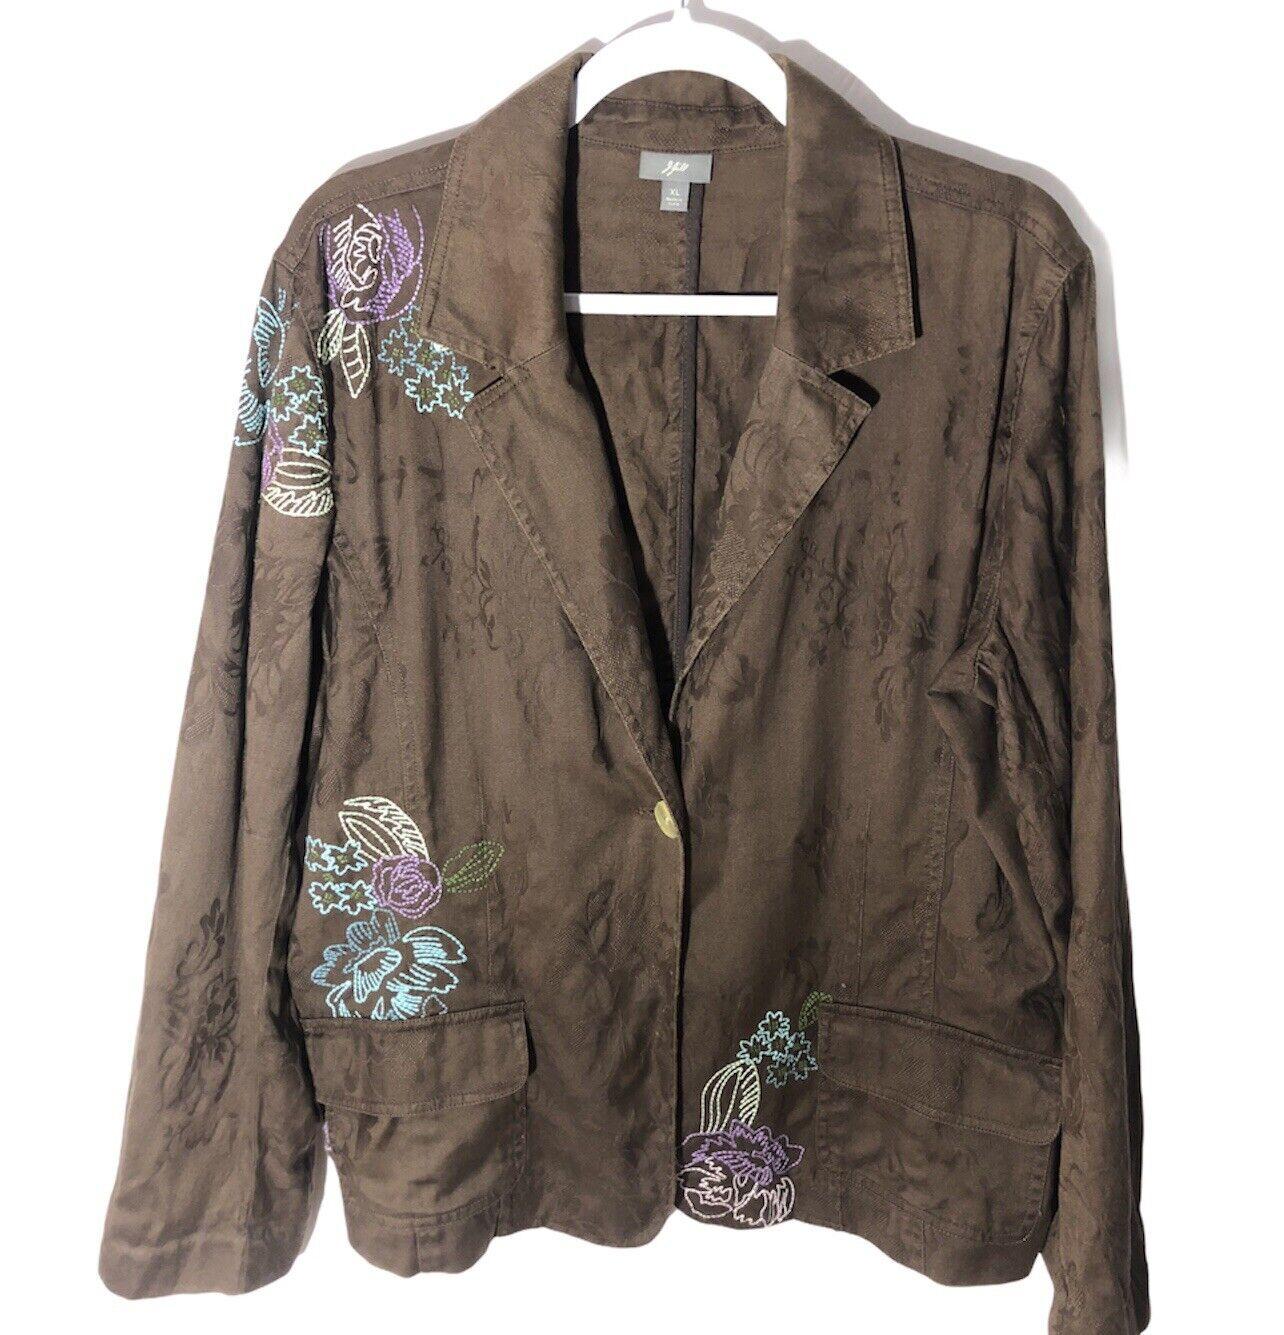 J. Jill Women's XL Brown Embroidered Floral One Button Long Sleeve Blazer Jacket